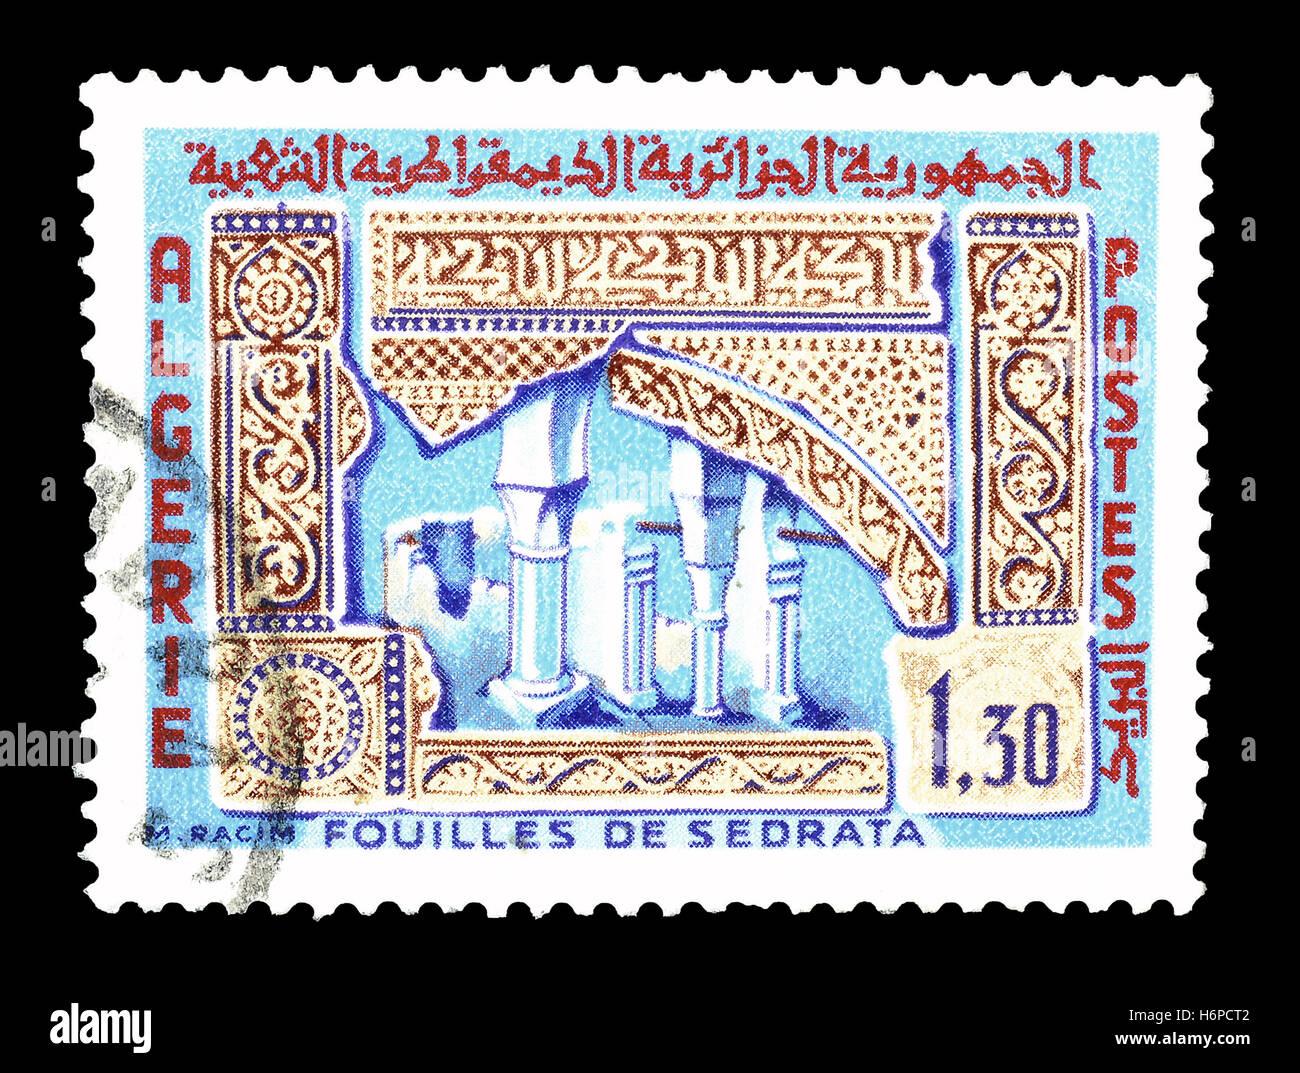 Timbres Algérie 1967 Photo Stock